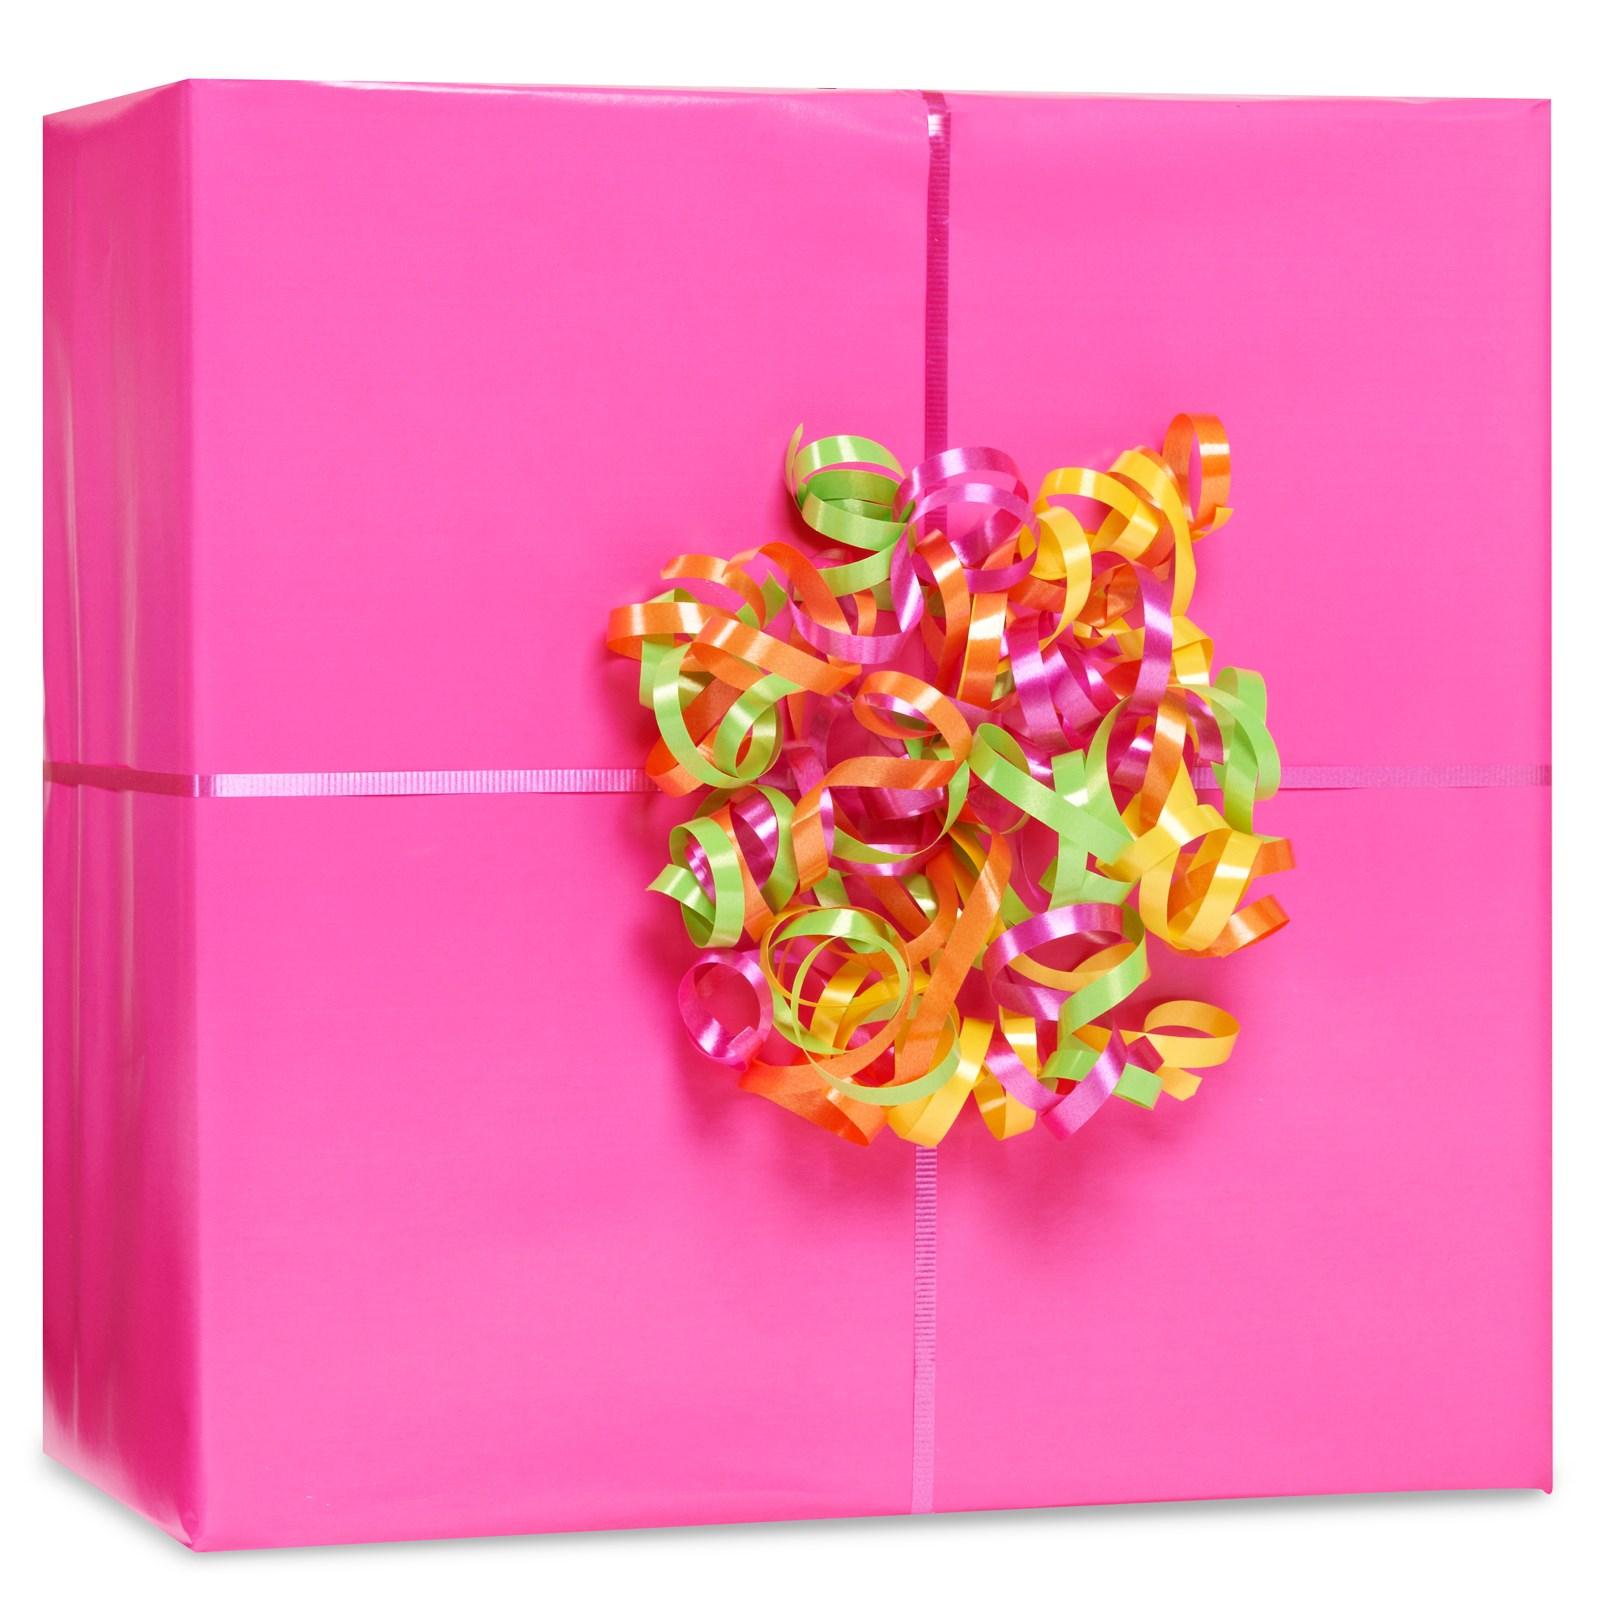 Image of Bright Pink Gift Wrap Kit